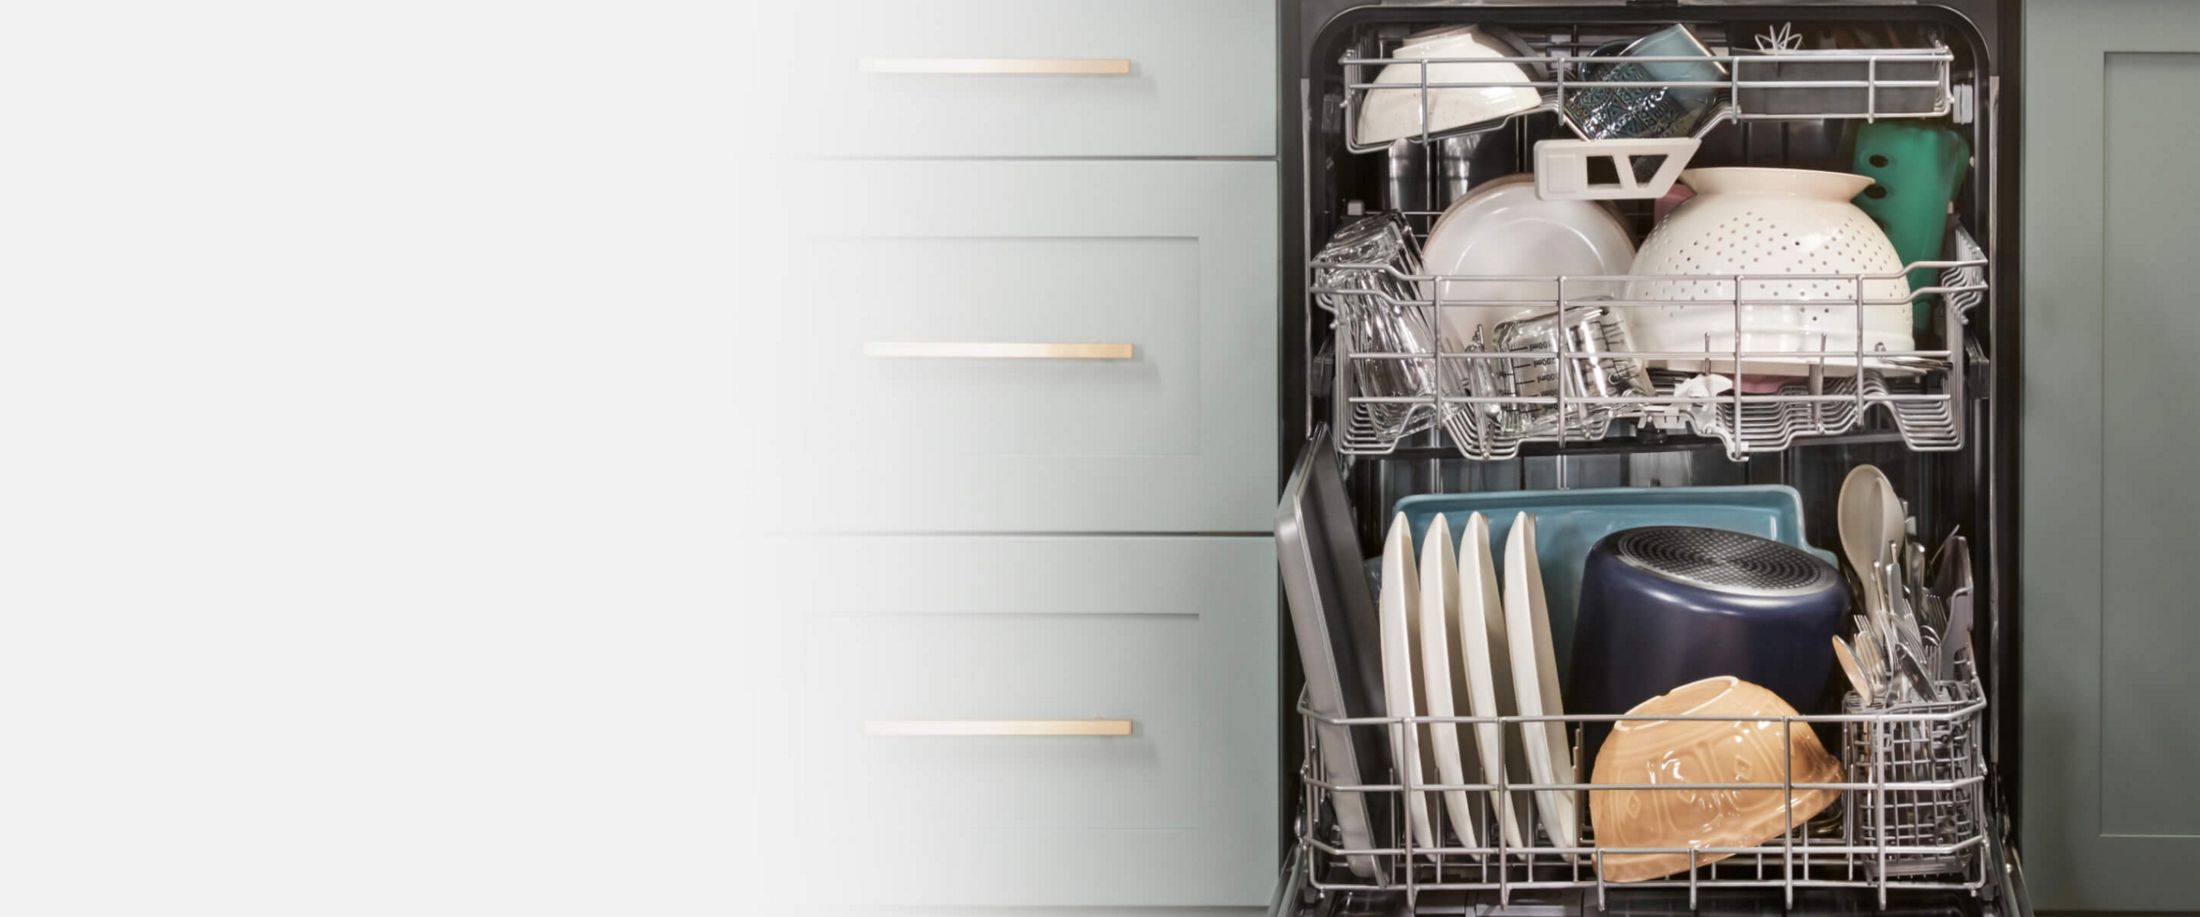 Wash sprays reach every rack to clean each dish